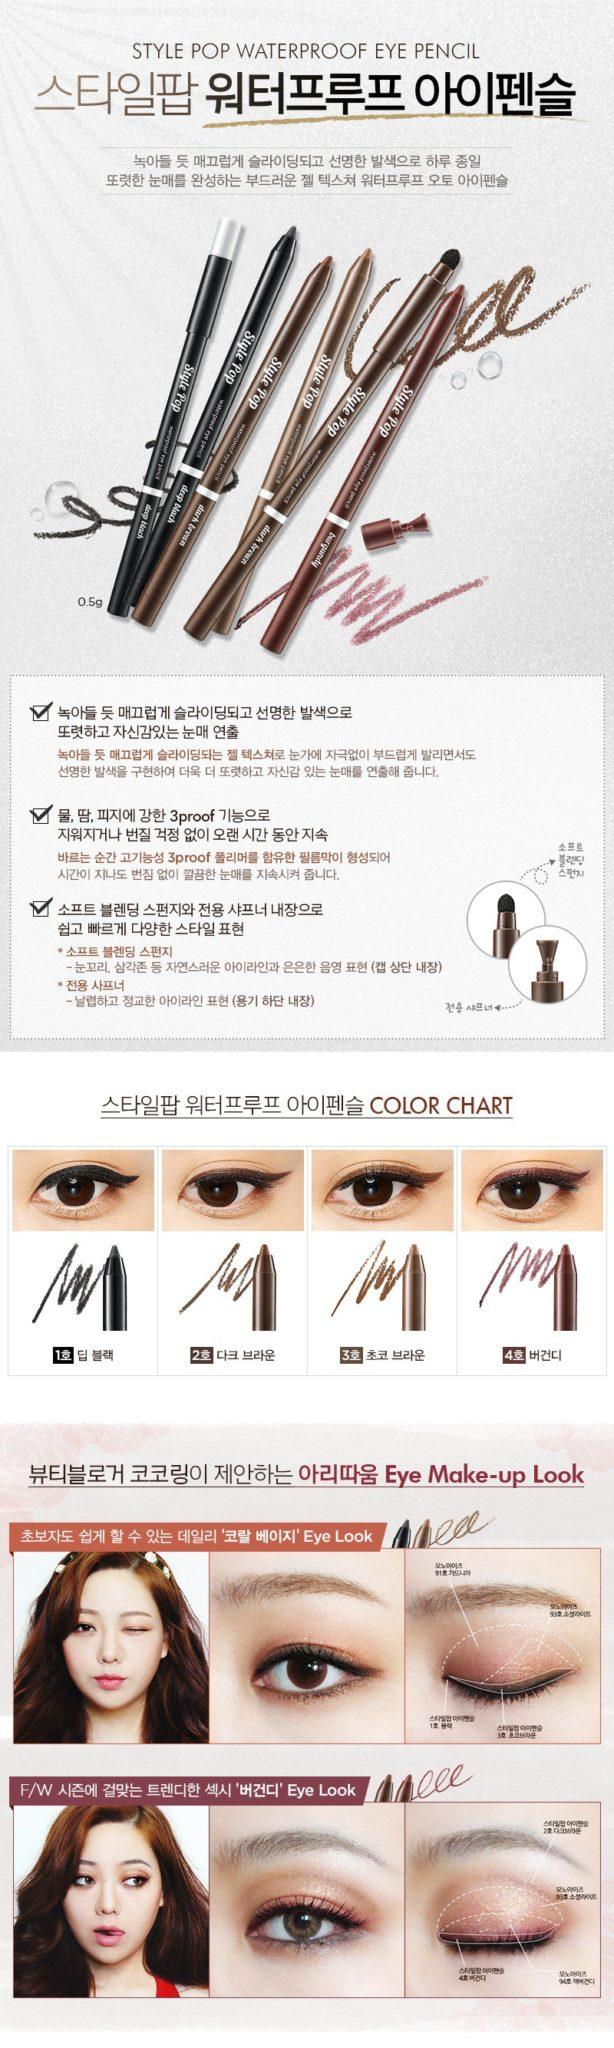 ARITAUM Style Pop Waterproof Eye Pencil 1g